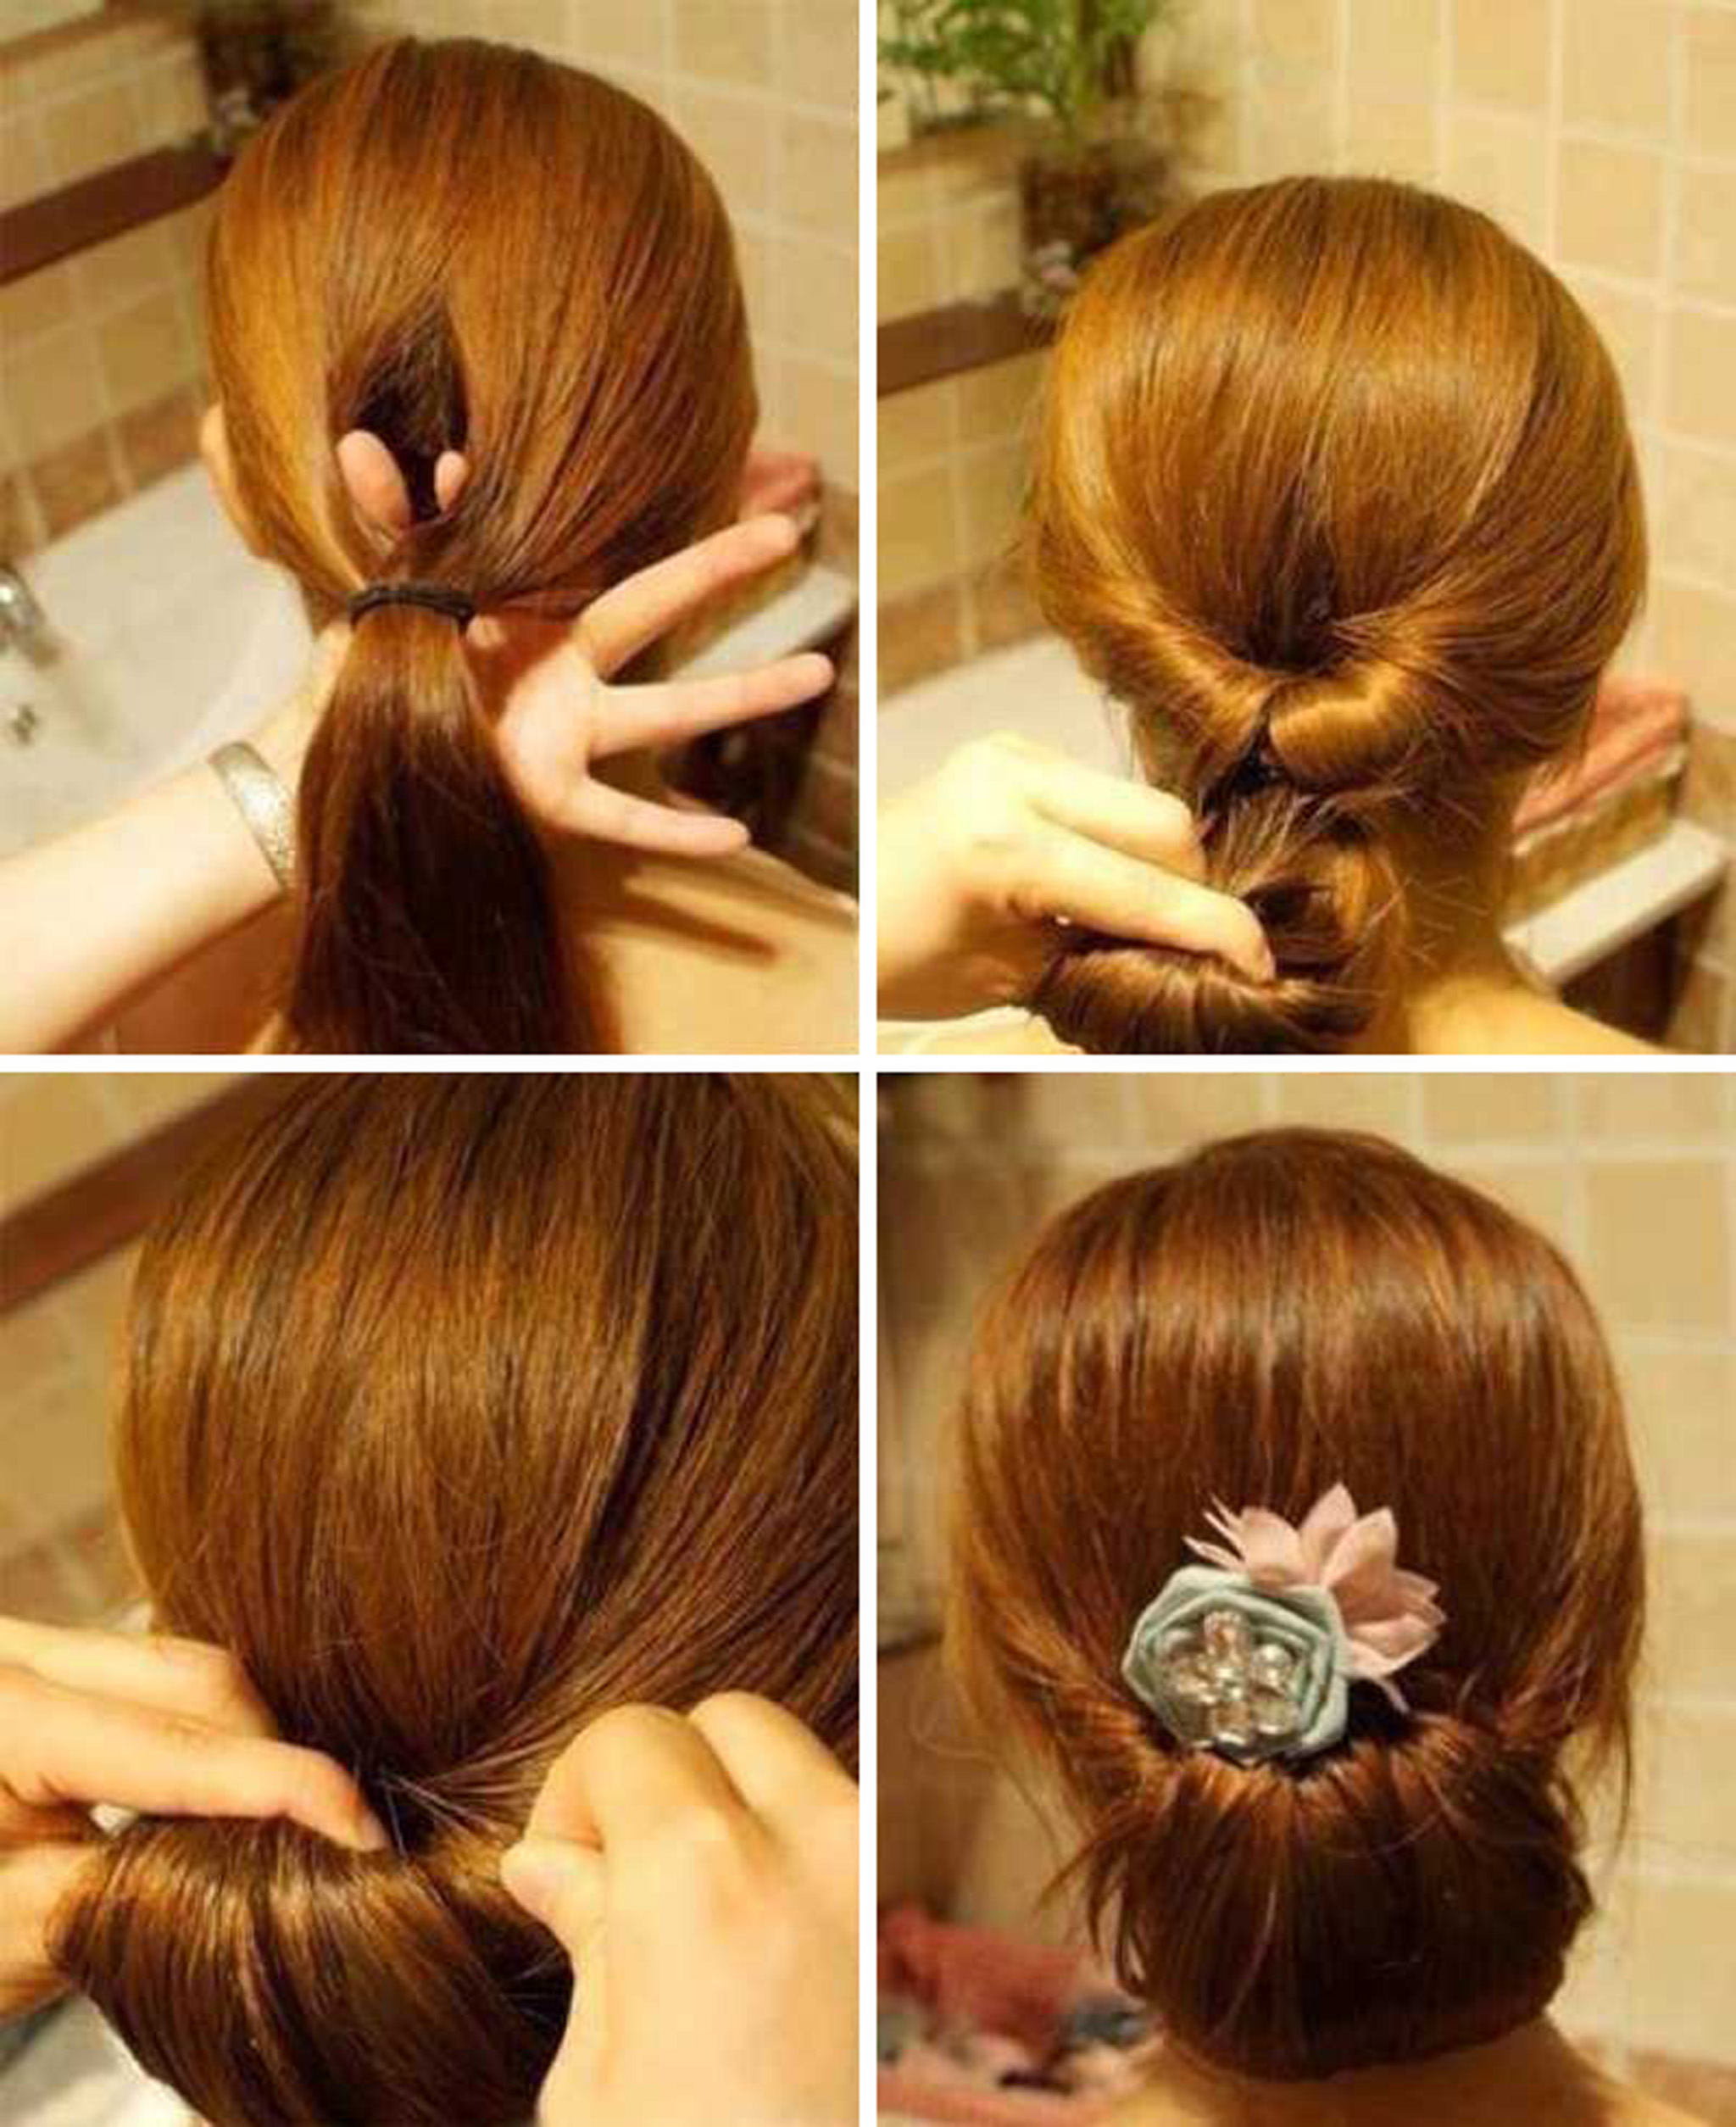 Easy Diy Bun Hairstyles: 10 Glamorous Bun Hairstyles Step By Step